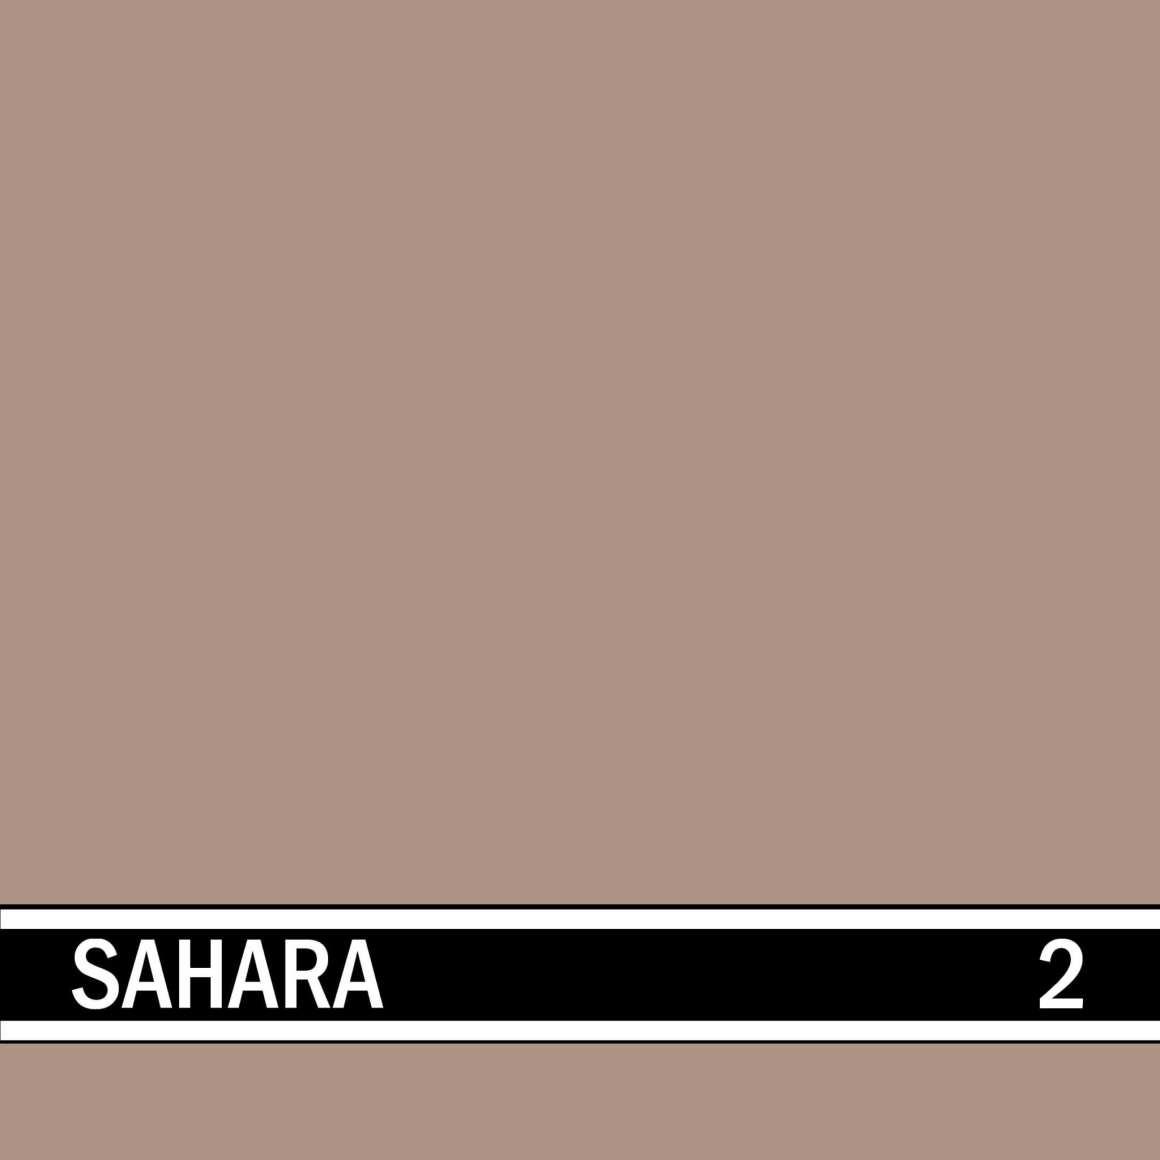 Sahara integral concrete color for stamped concrete and decorative colored concrete